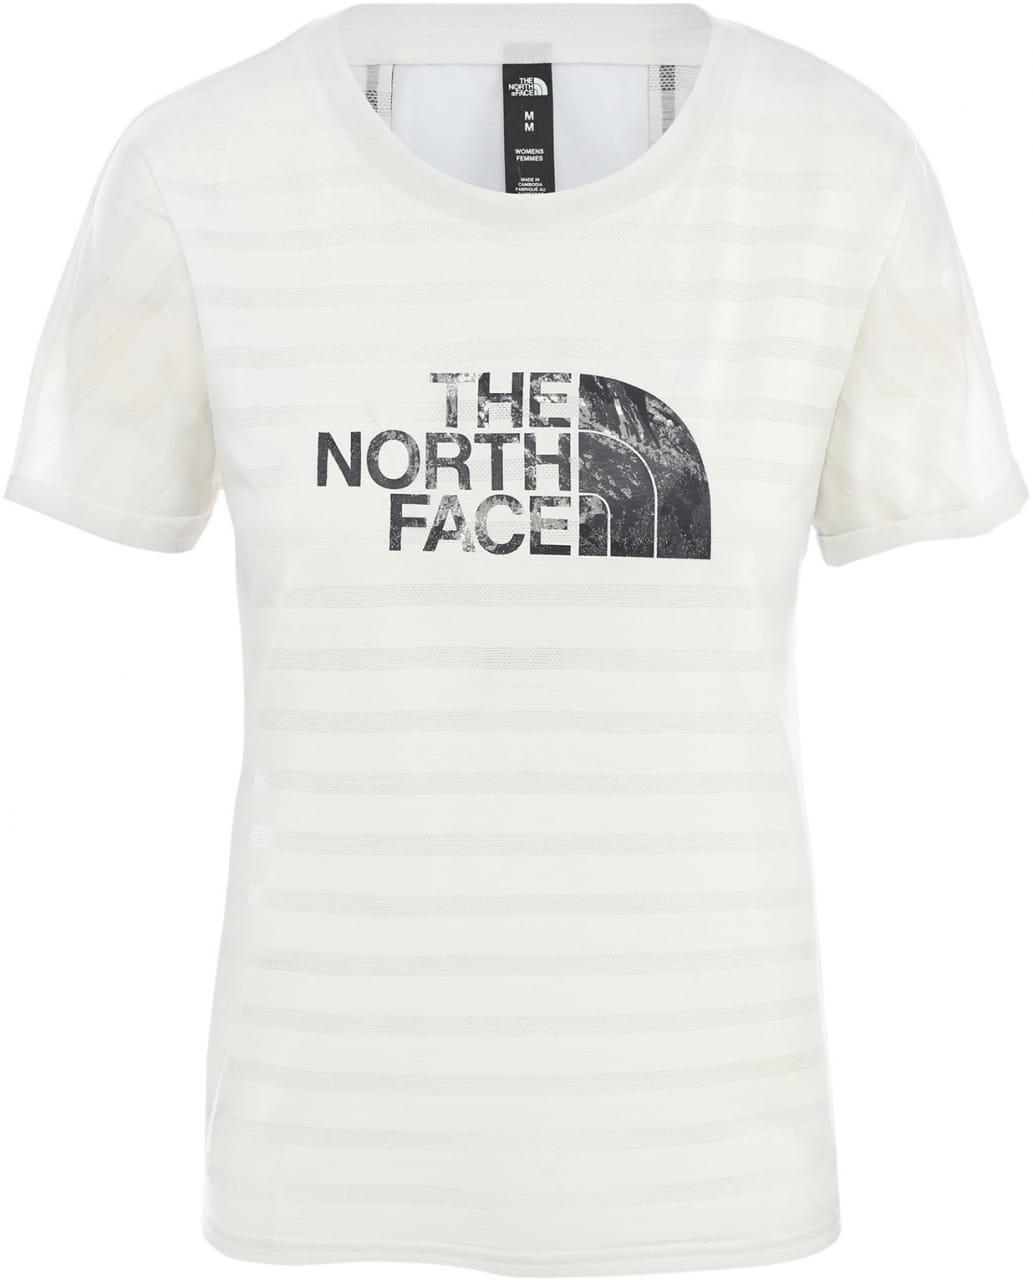 T-Shirts The North Face Women's Varuna T-Shirt